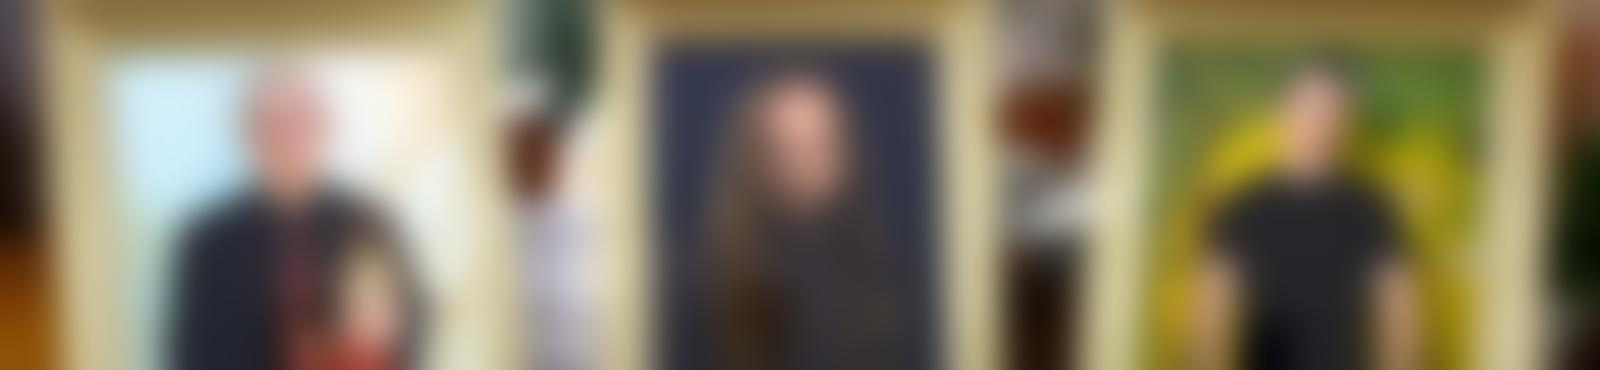 Blurred d82aff13 5111 4033 8969 74b533a9ff25